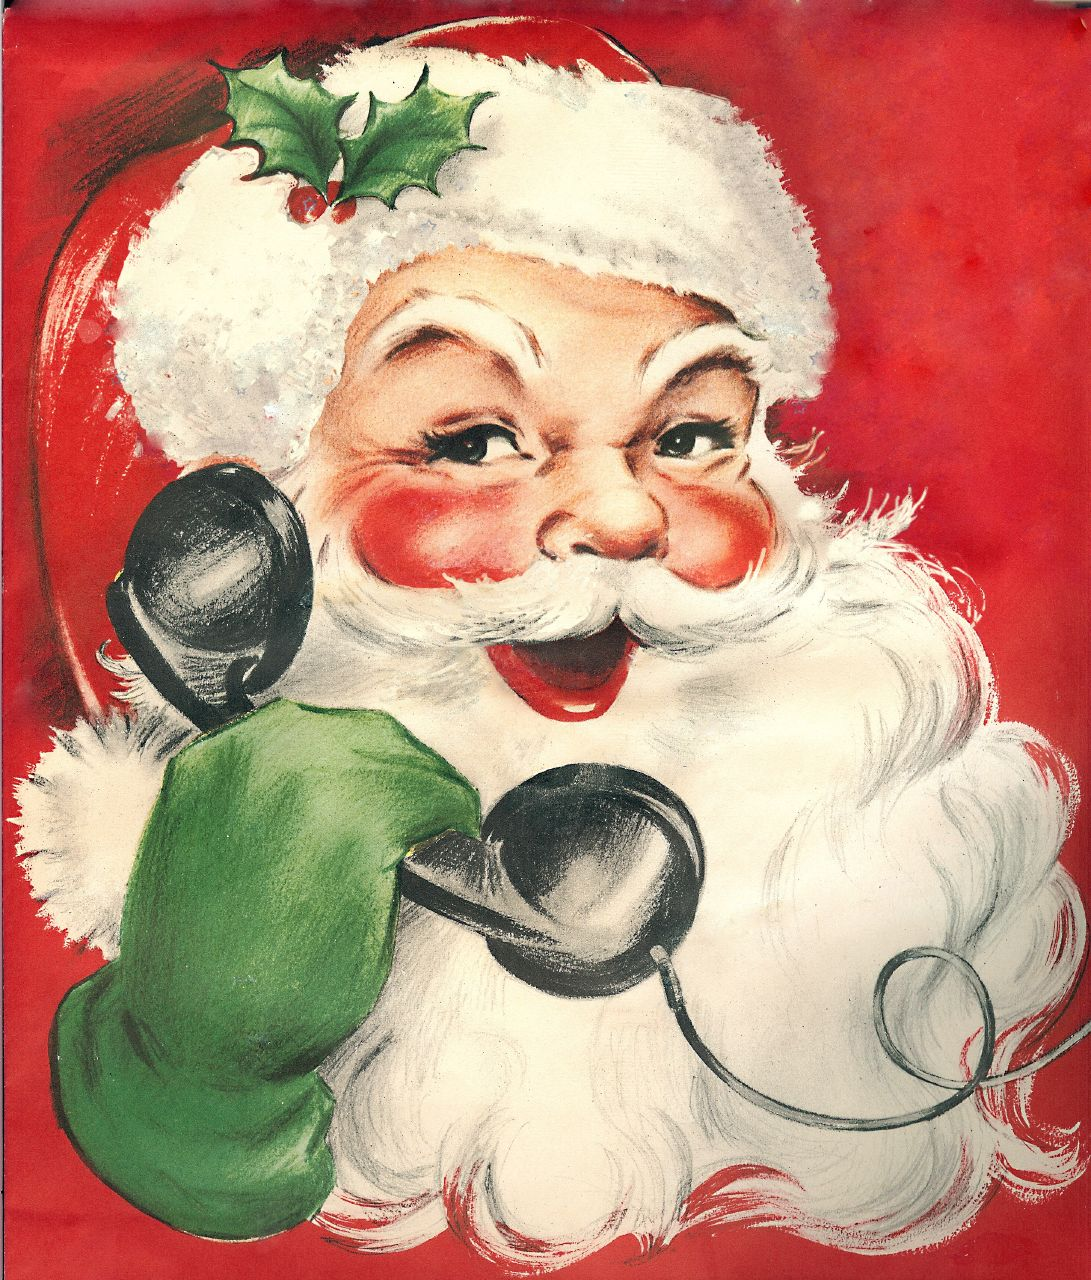 Vintage Santa Images 61